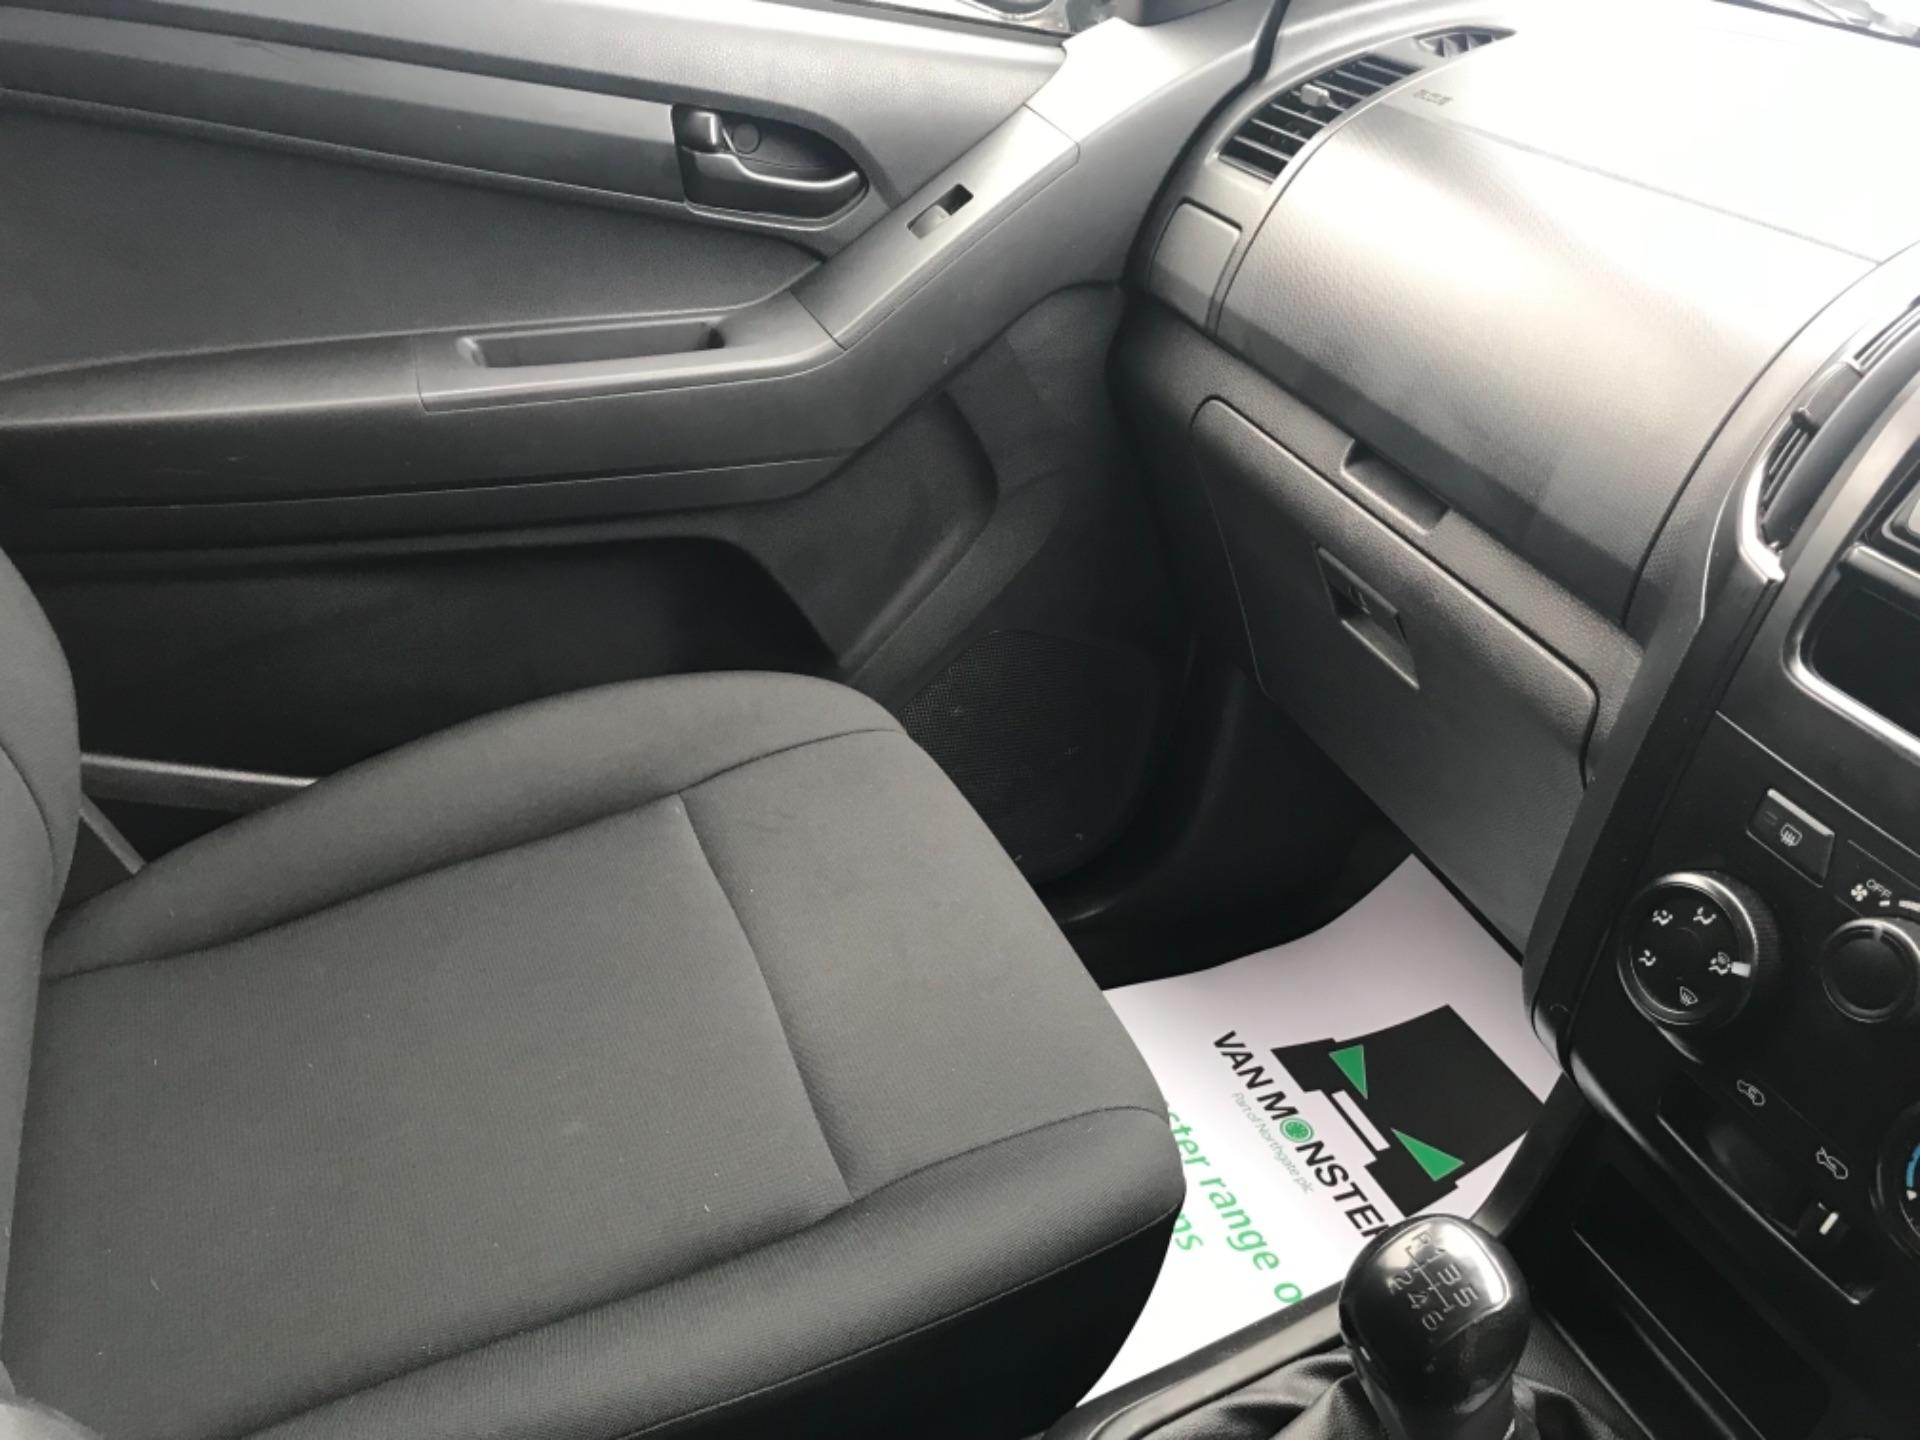 2018 Isuzu D-Max 1.9 Double Cab 4X4 (YG18FZJ) Image 11